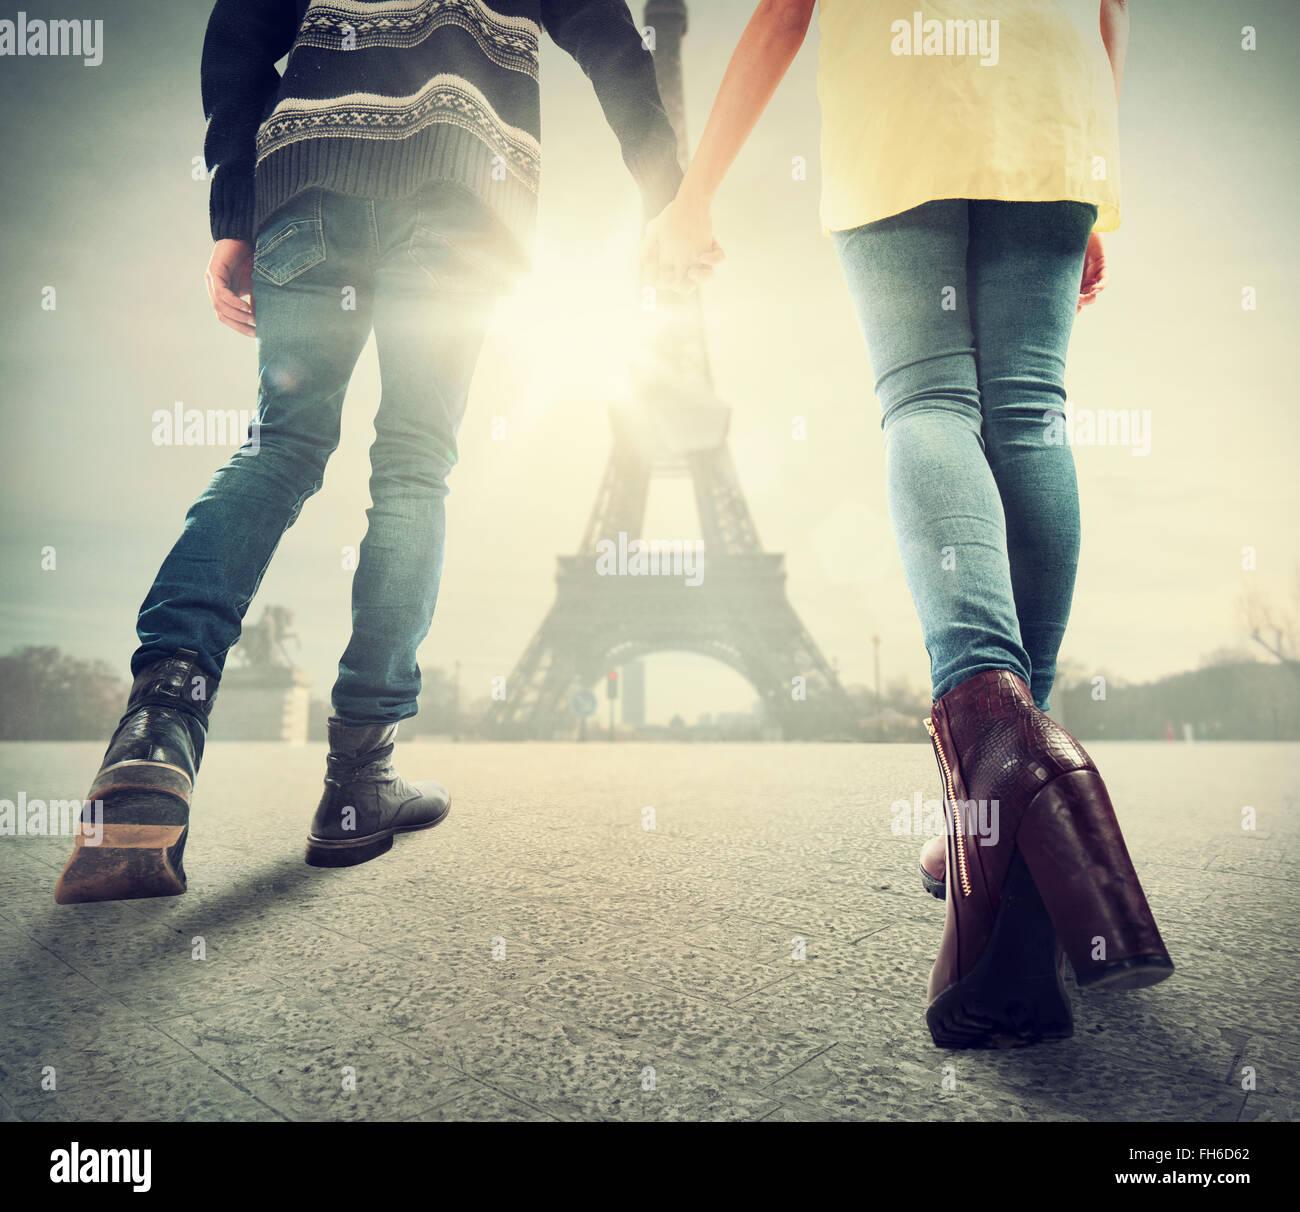 Matura in amore a Parigi Immagini Stock